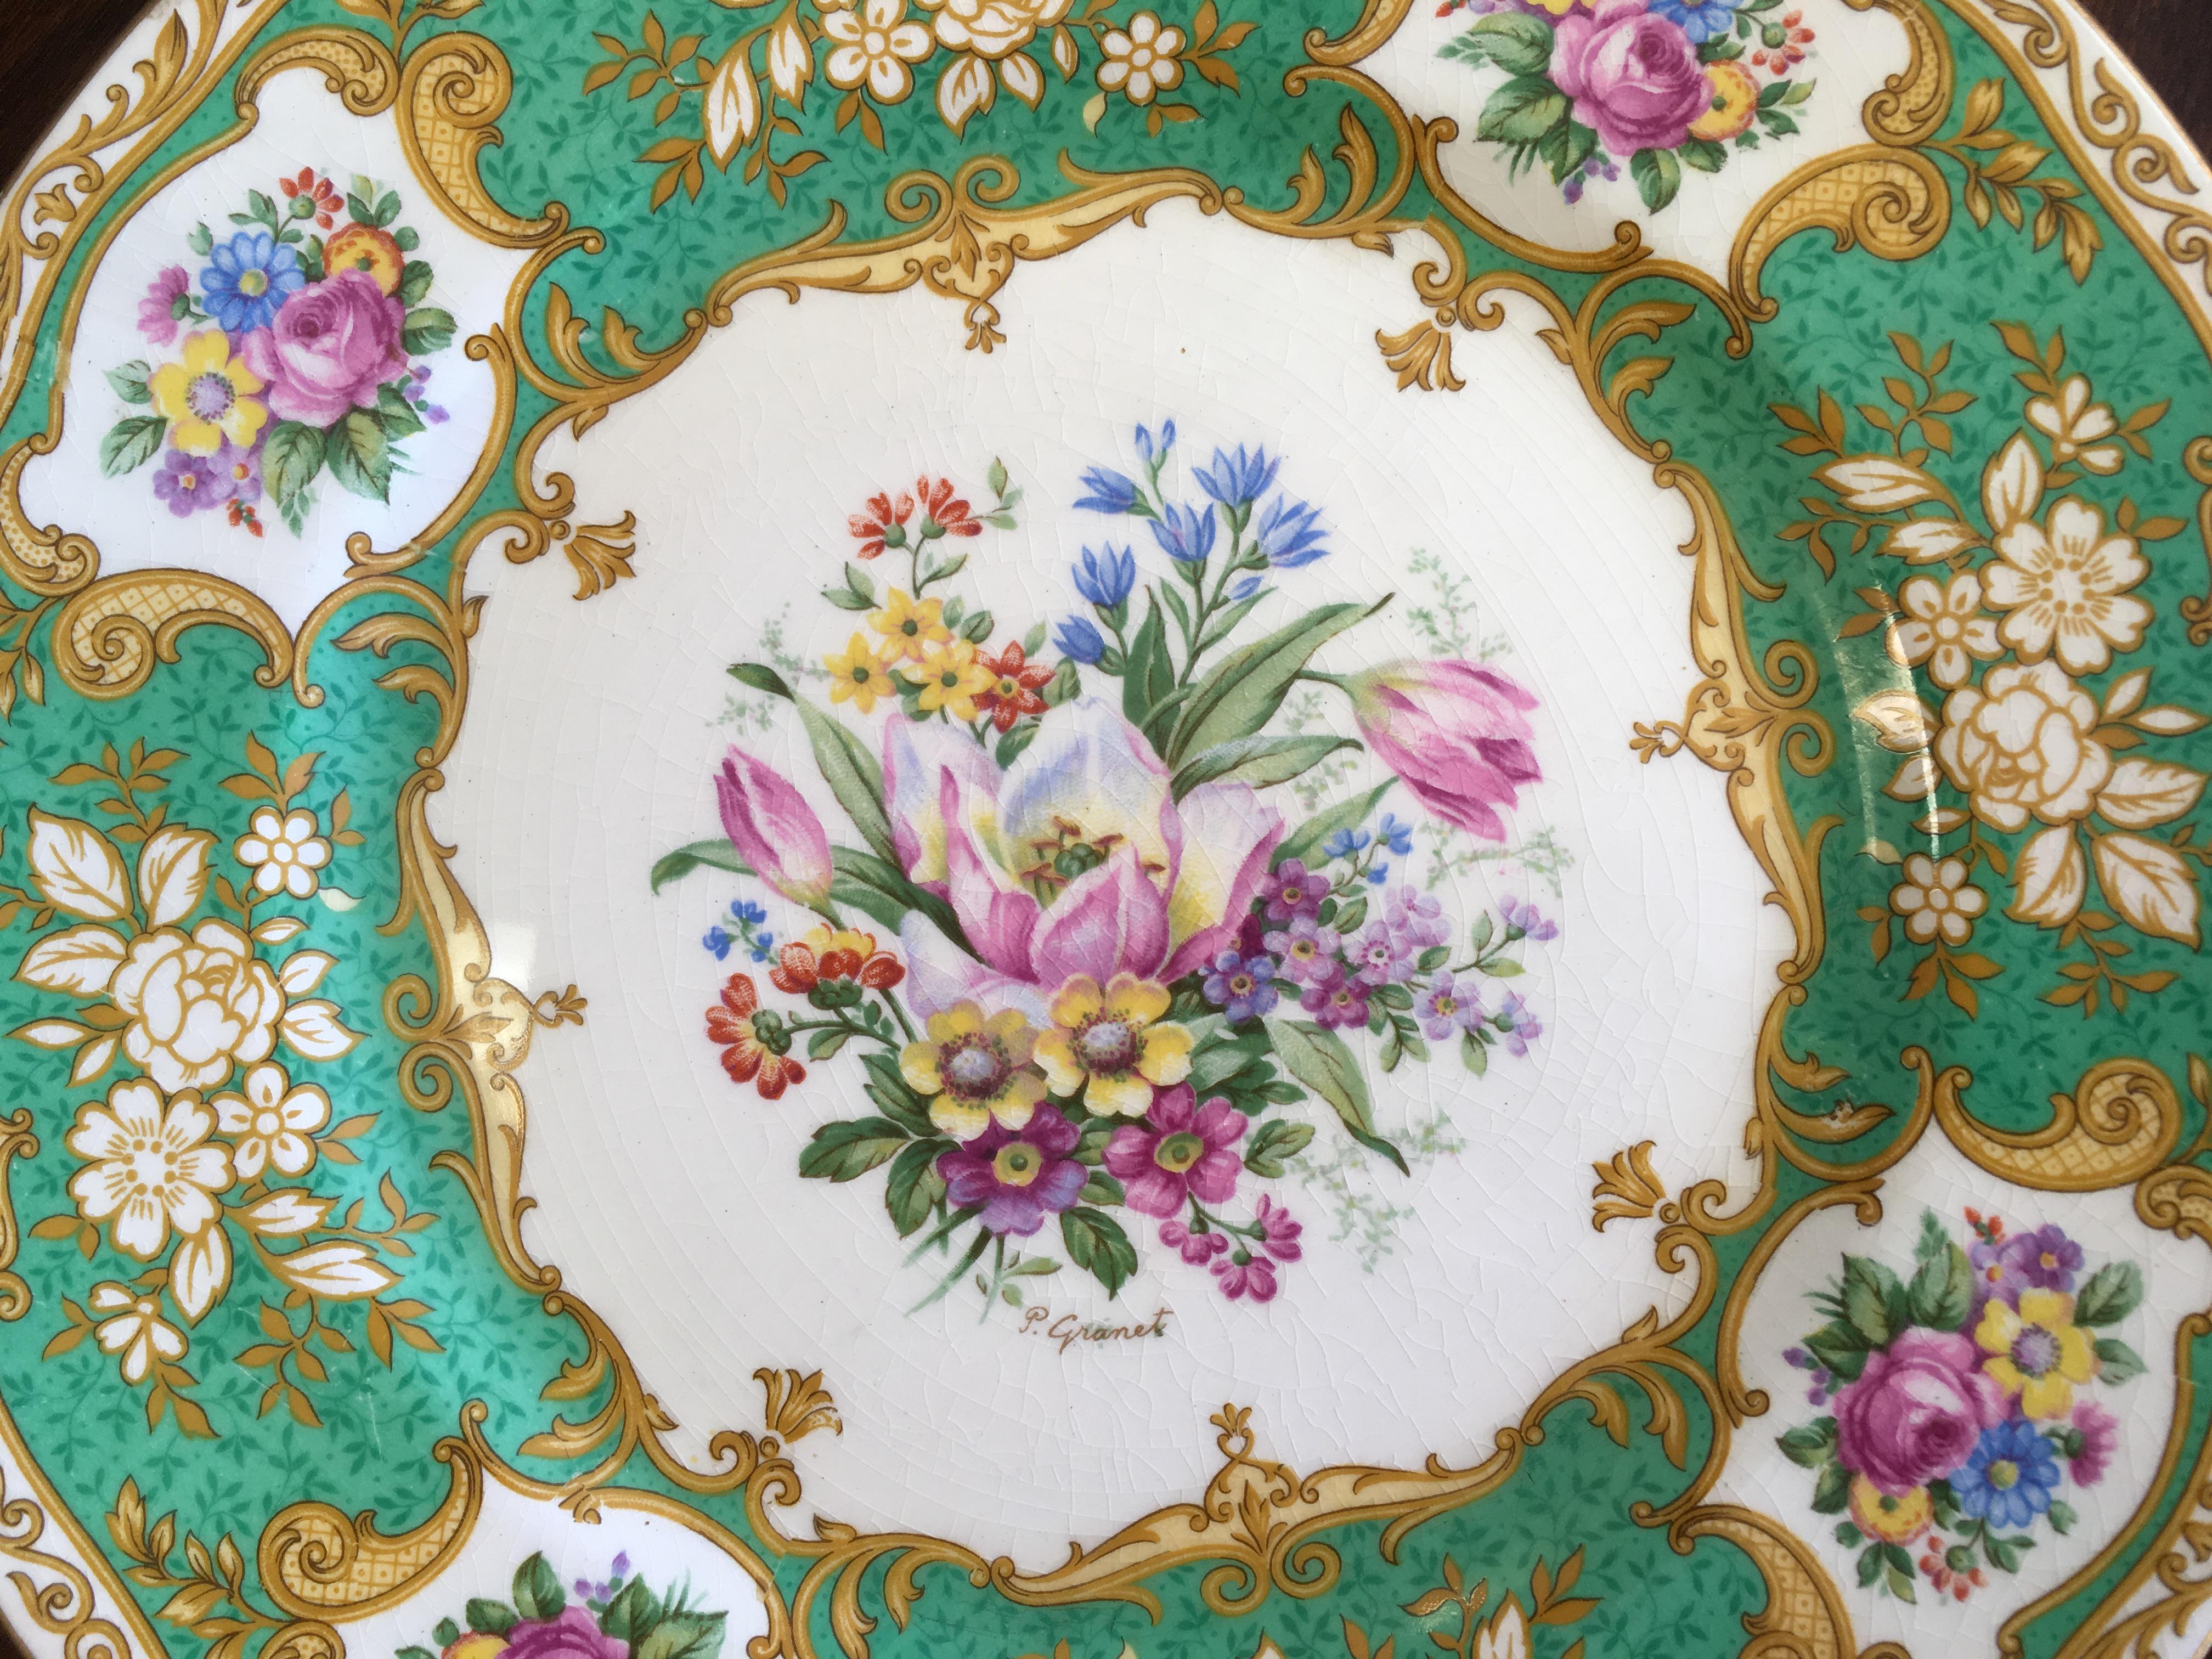 Myott Staffordshire Dinner Plates - Set of 14 - Image 4 of 11  sc 1 st  Chairish & Myott Staffordshire Dinner Plates - Set of 14   Chairish